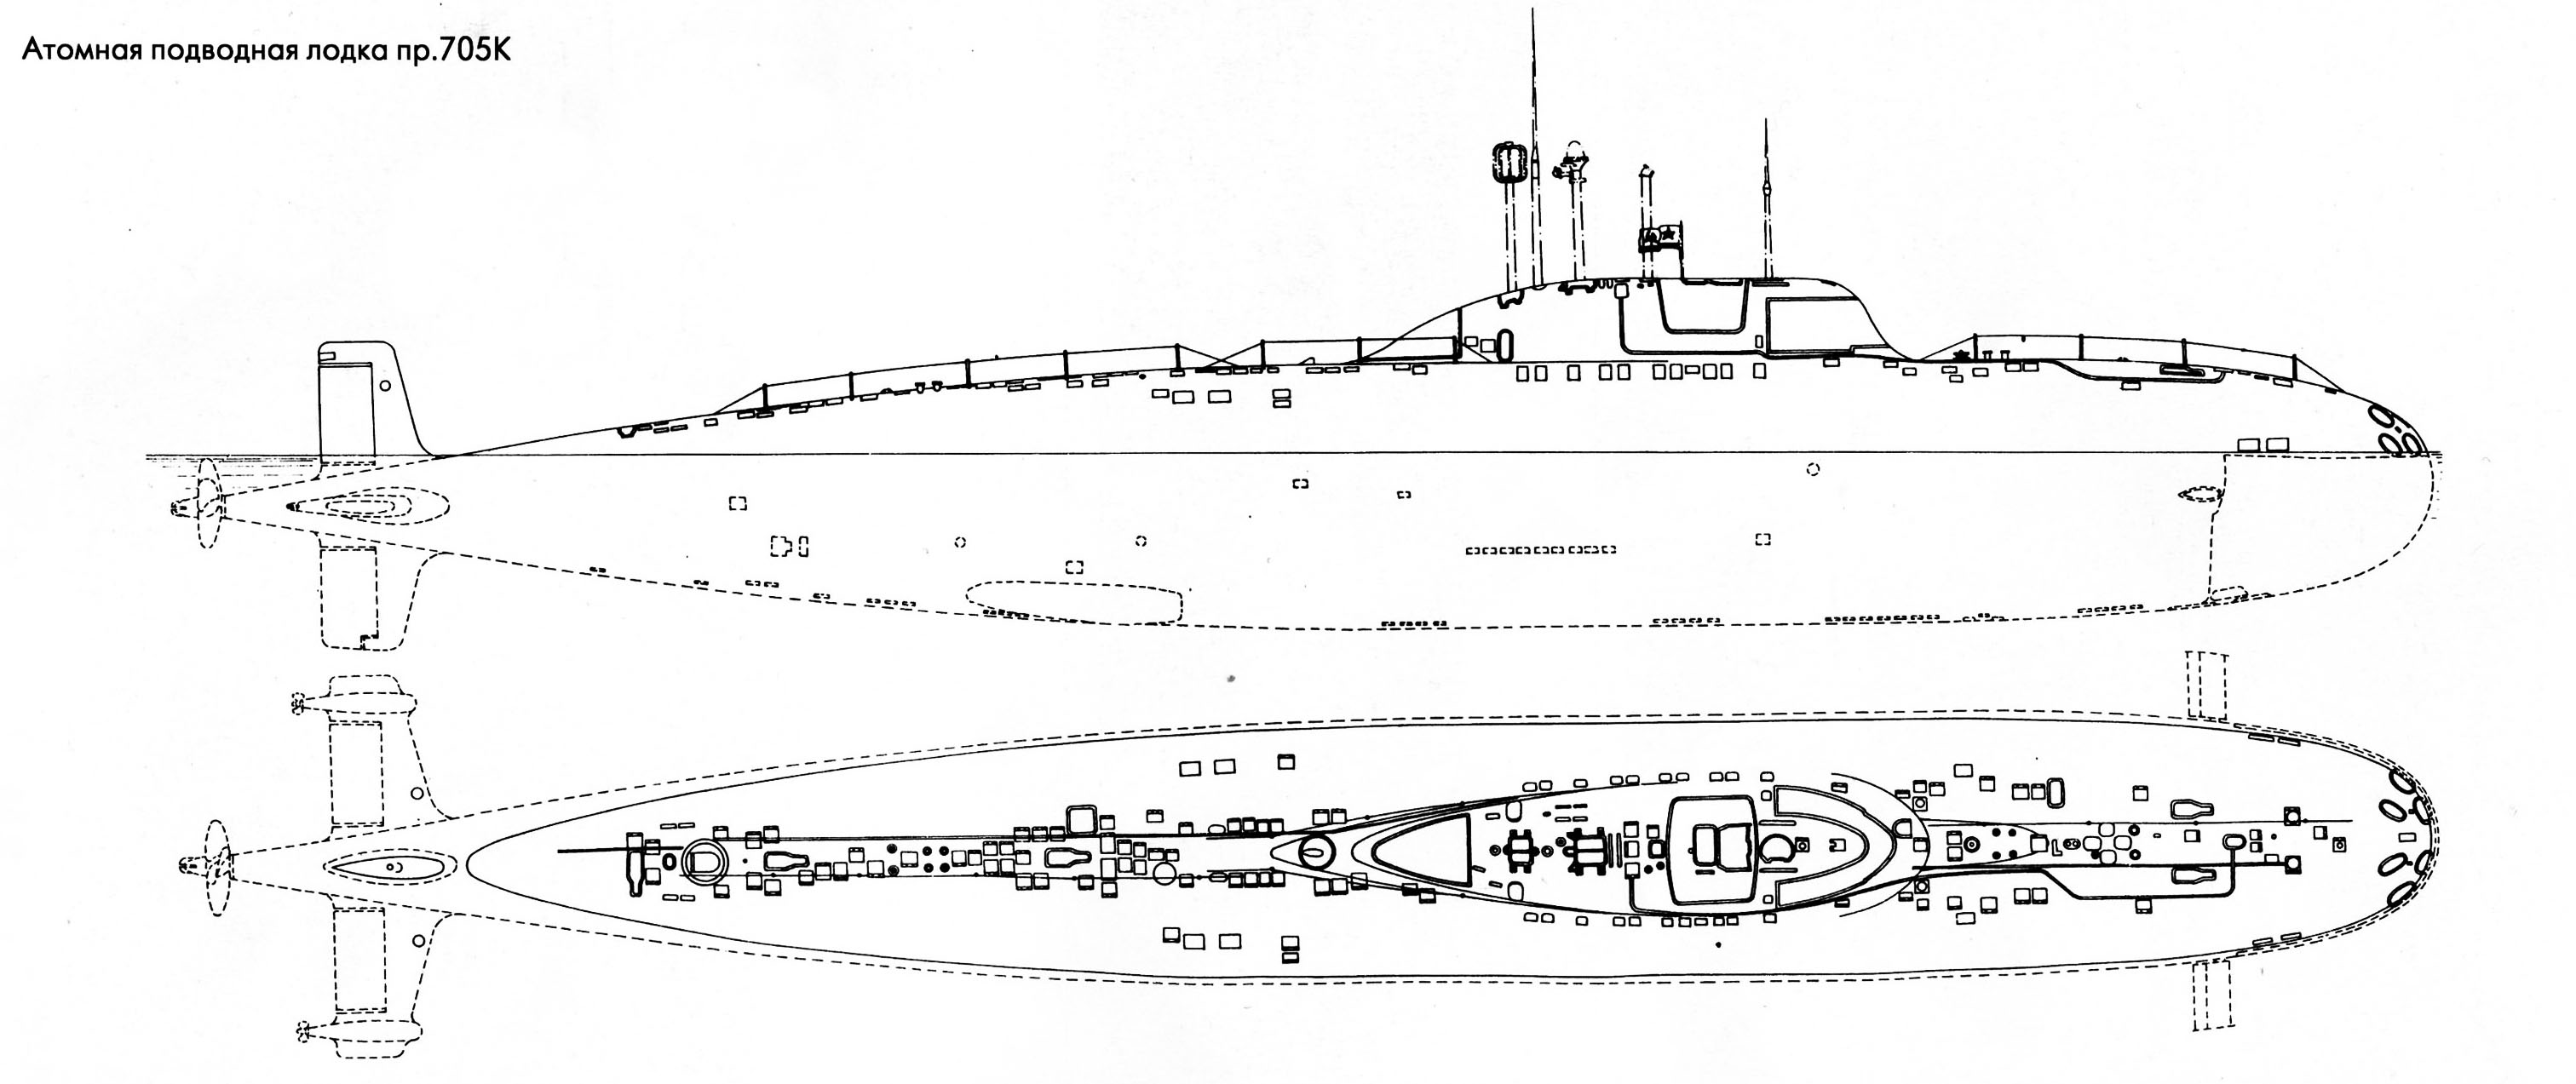 Чертежи подводной лодки